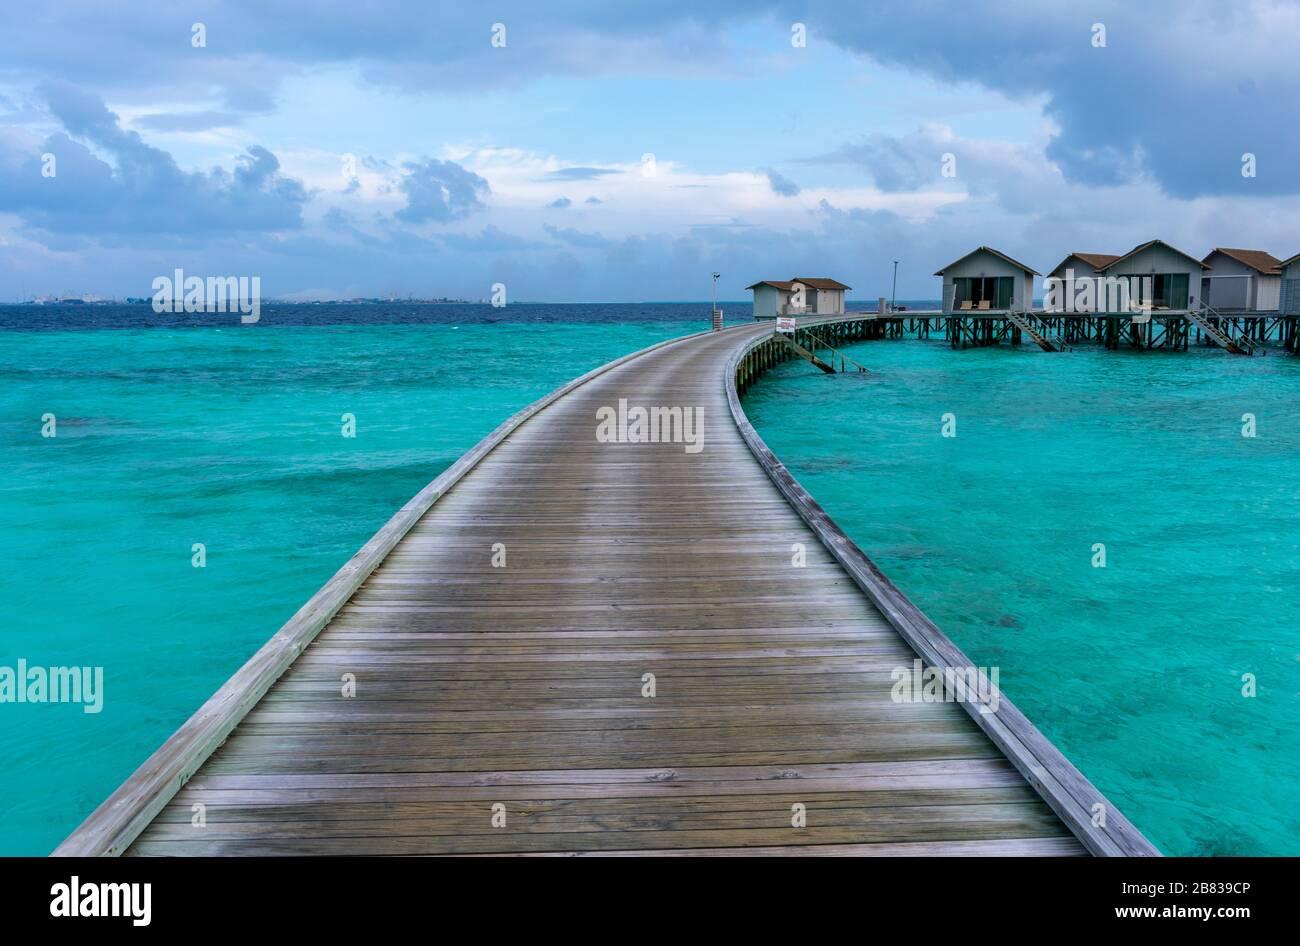 North Malé Atoll, Maldives - December 29 2019 - A wooden pier towards the water villas Stock Photo